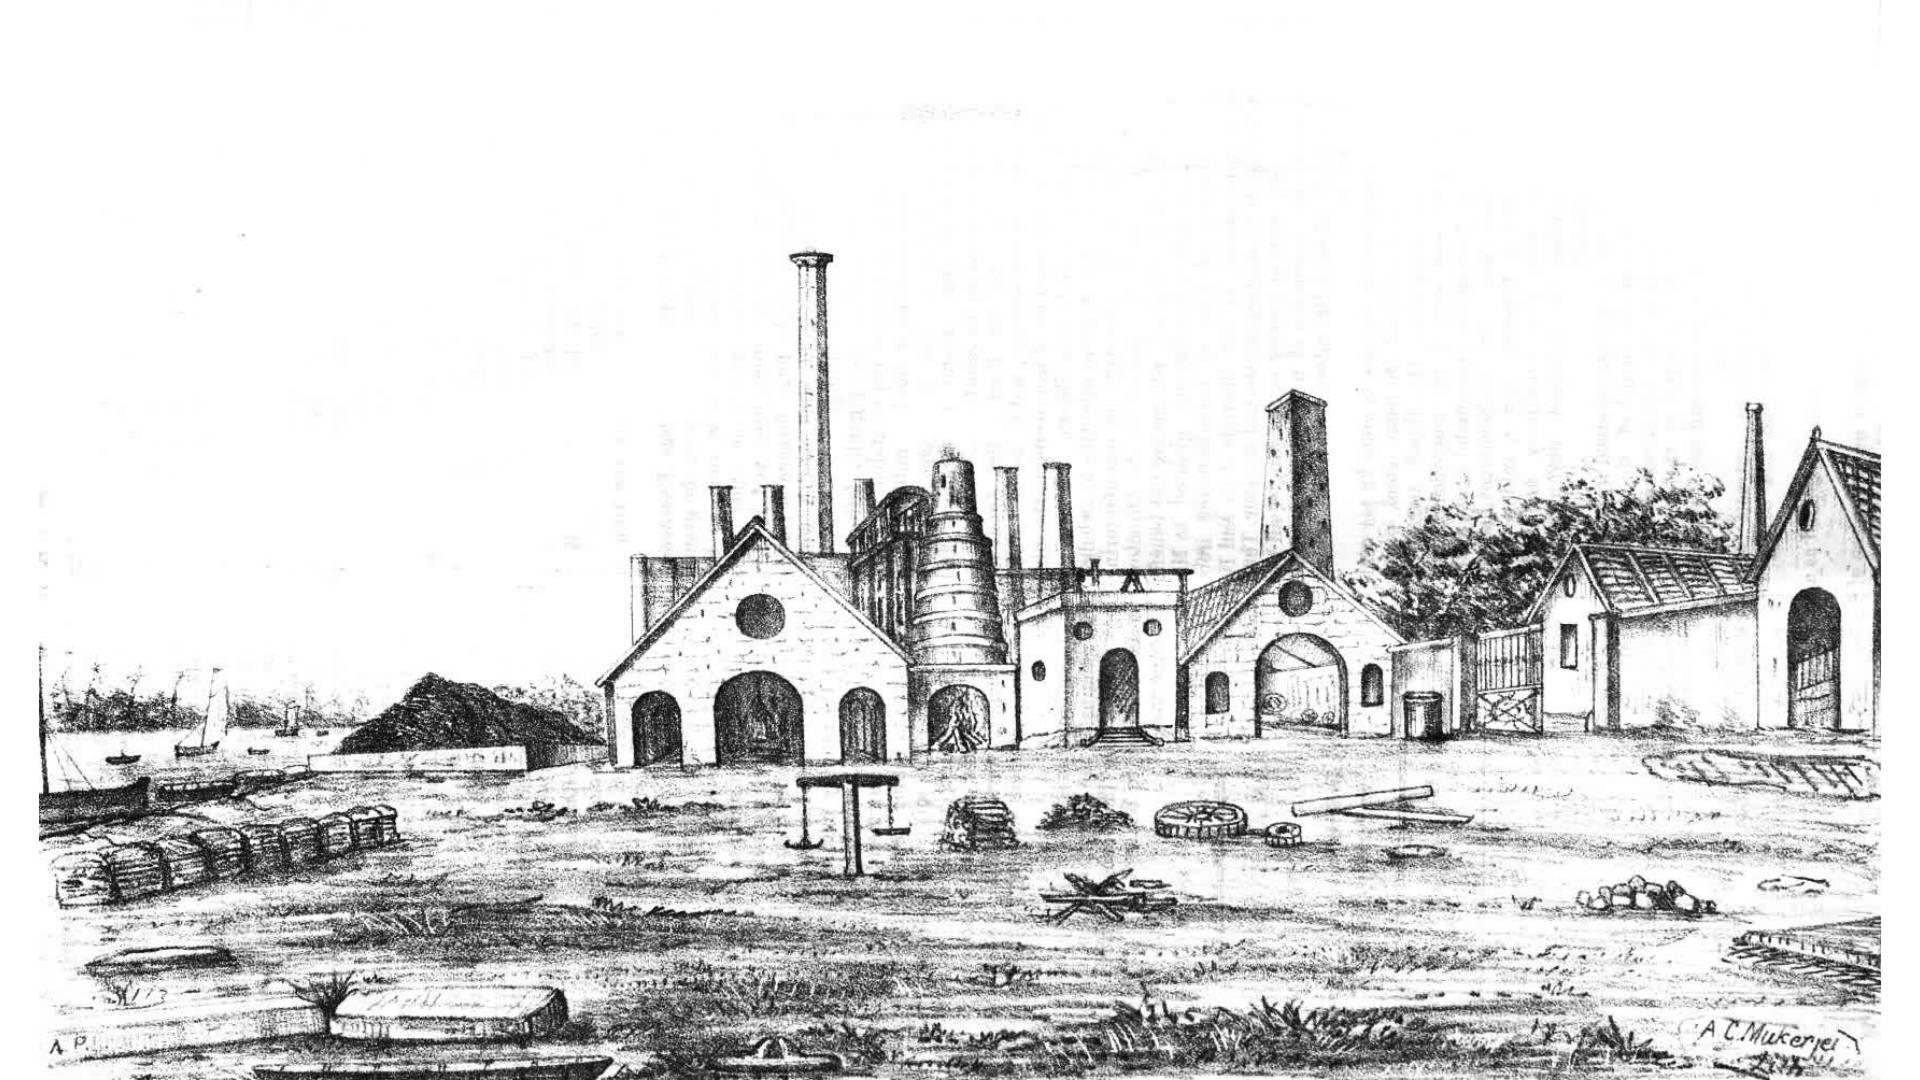 Parangipettai: Home To India's First Iron & Steel Plant